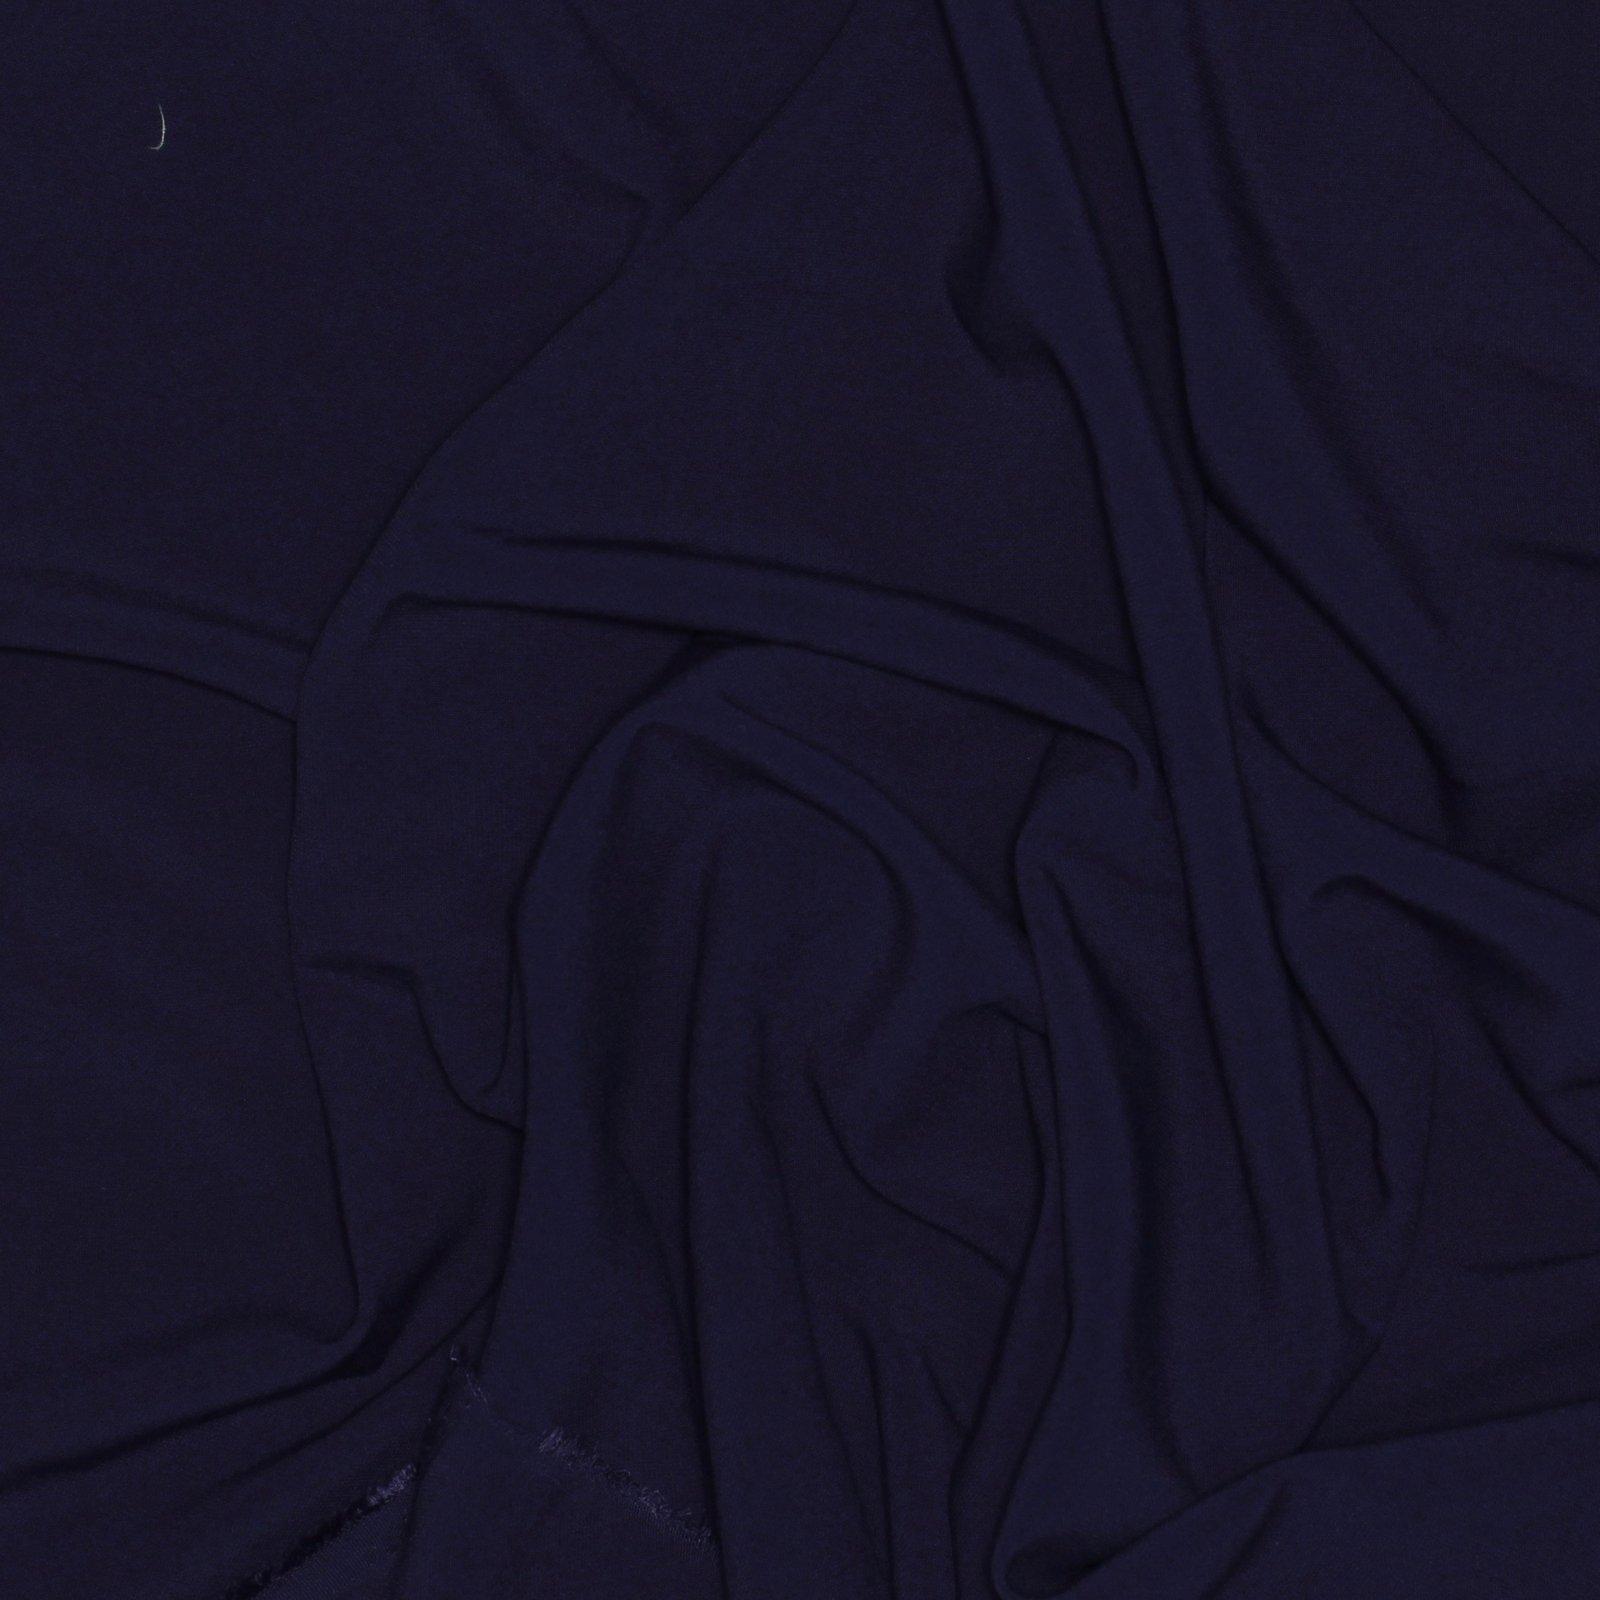 Telio Downtown Suiting - Dark Mauve